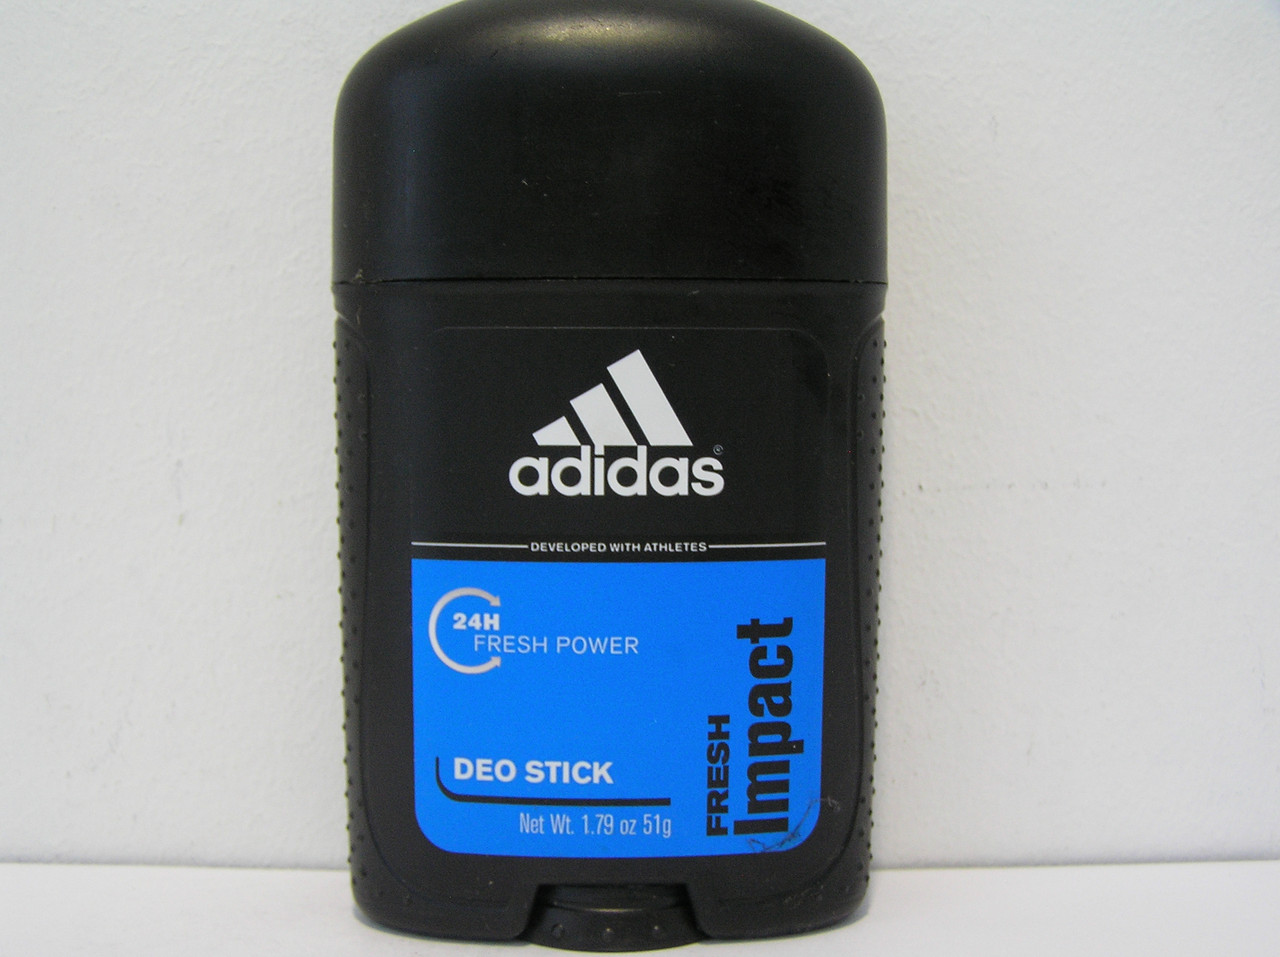 Tвердый дезодорант антиперспирант Adidas Fresh Impact (Адидас Фреш Импакт